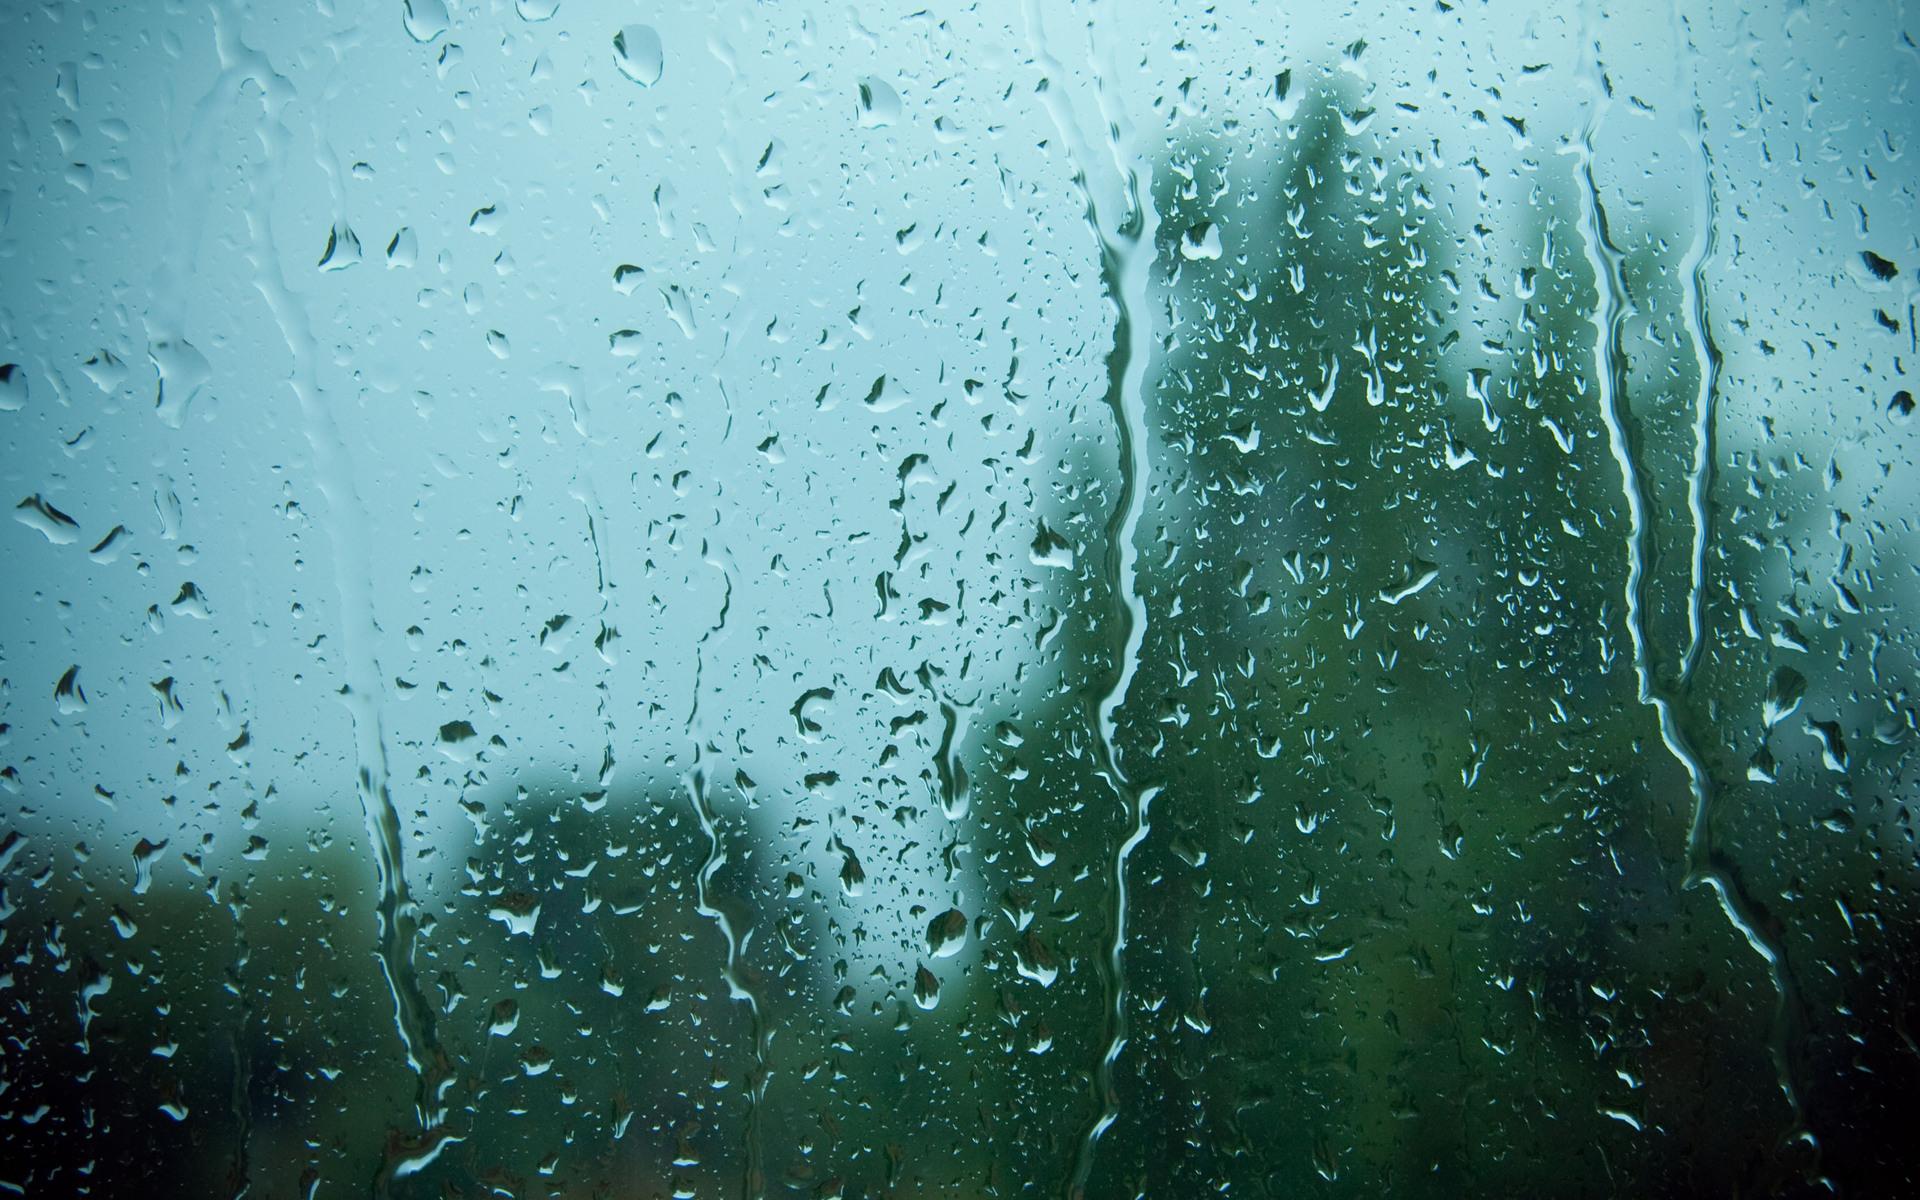 Free Download Rain On Window Hd Wallpaper 1920x1200 For